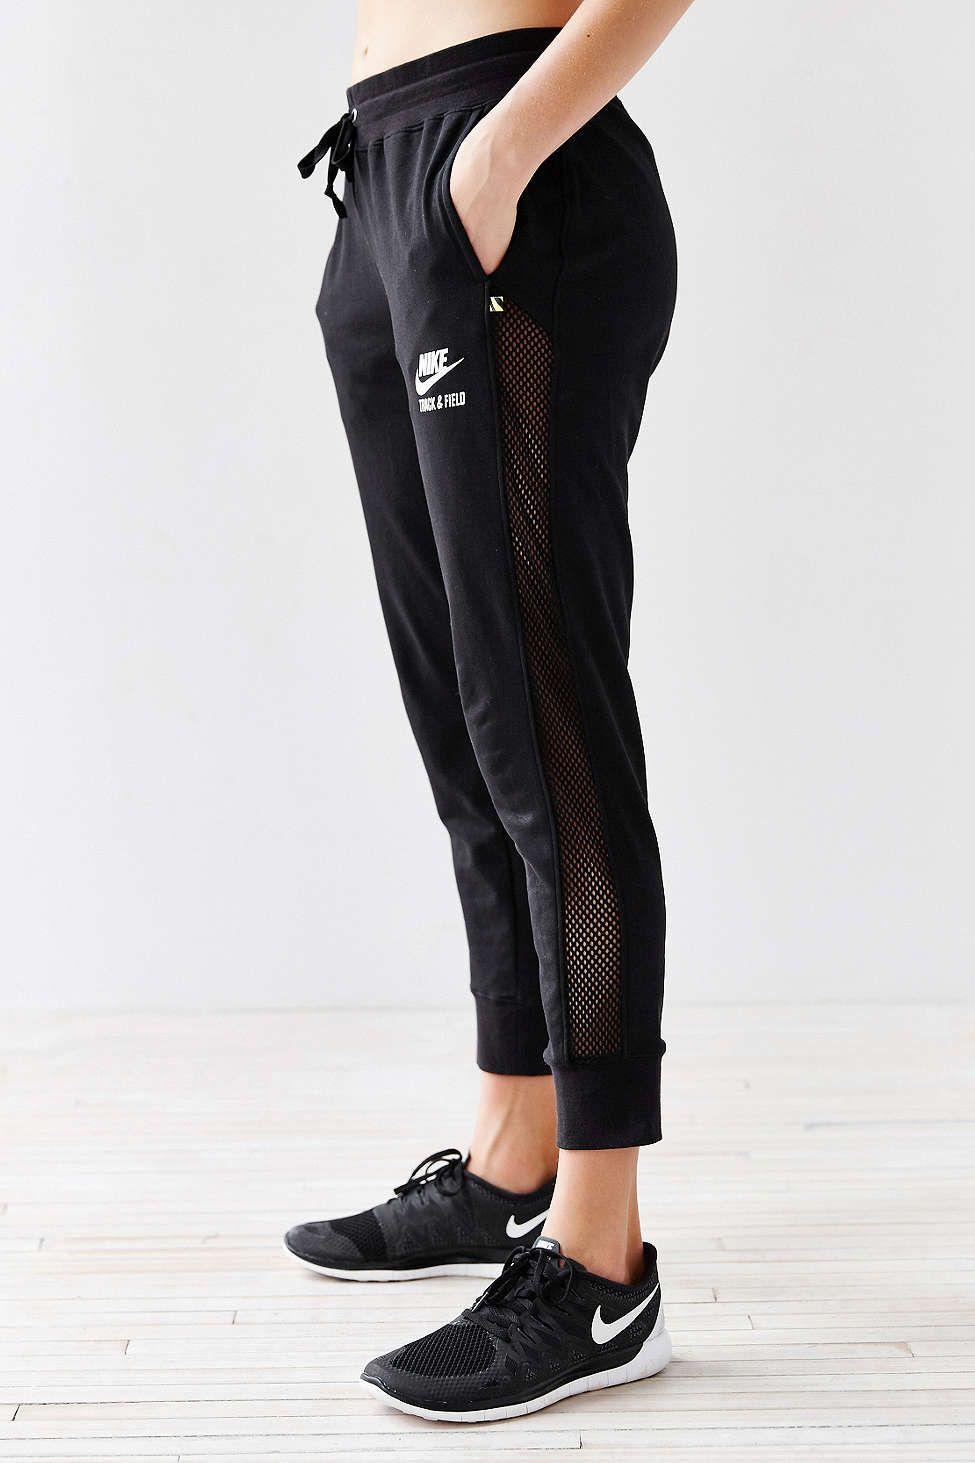 dc0165e0b096 top quality nike air max 90 jogger pants manila ef1cf a09ff